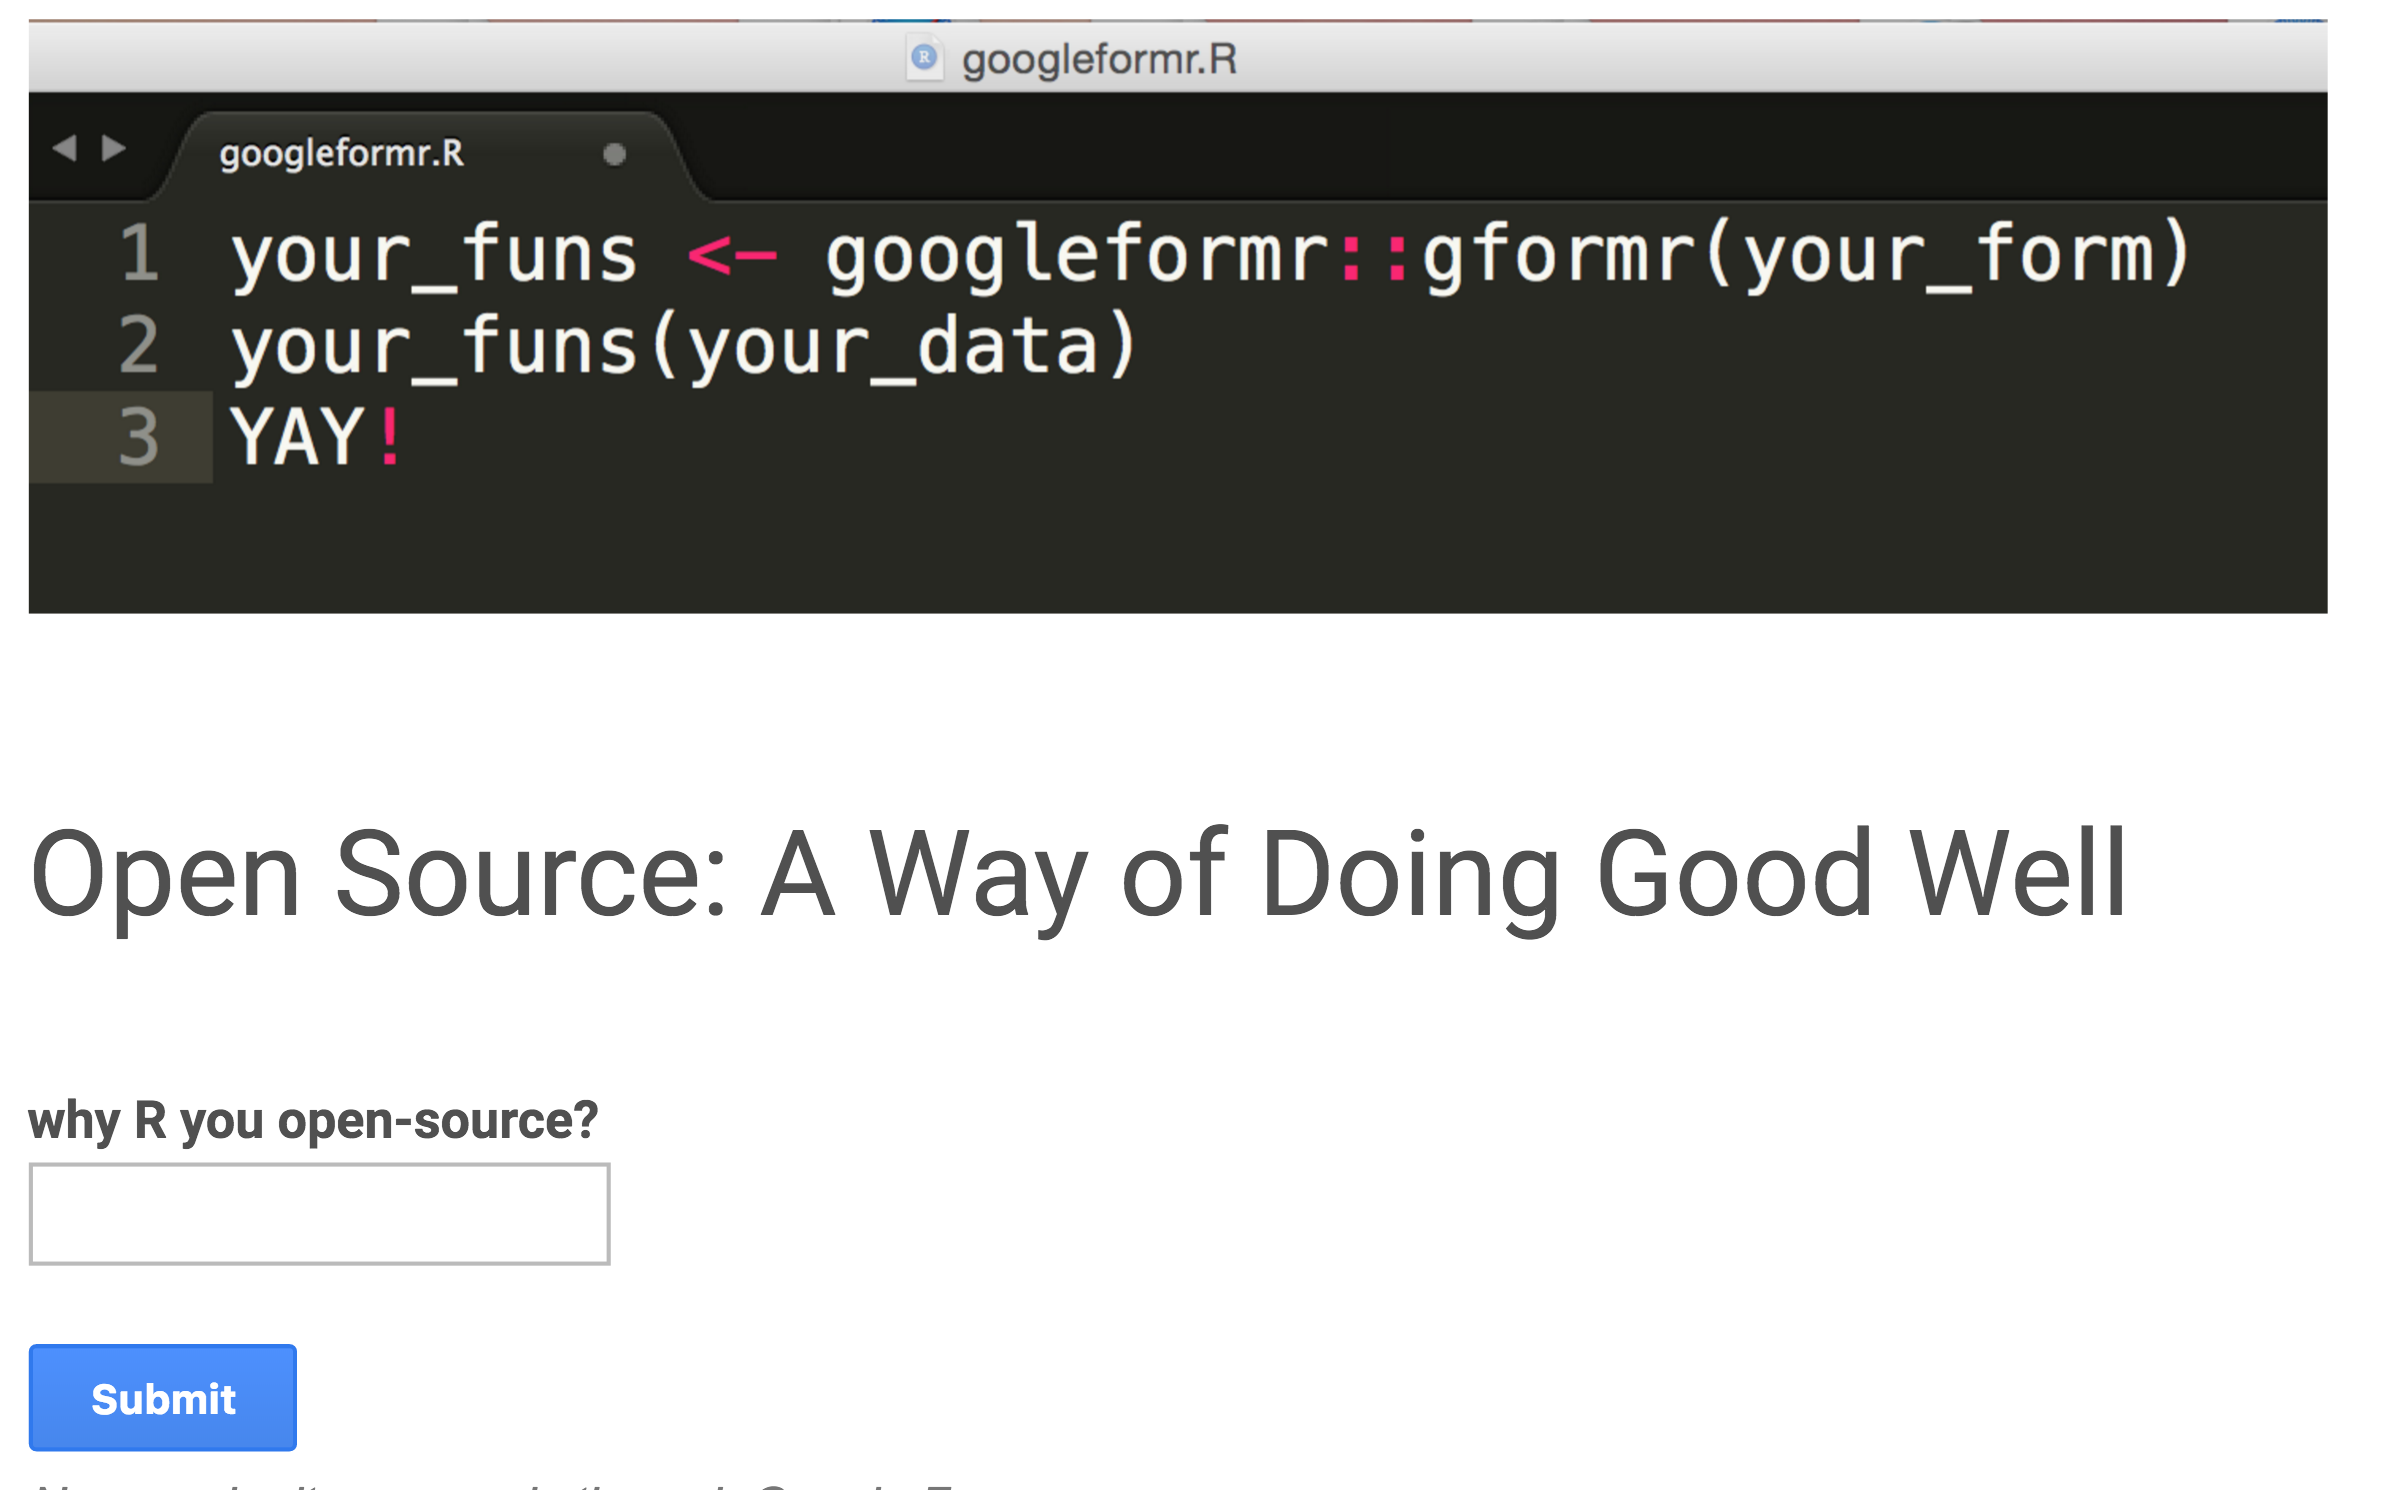 googleformr asks – why R u open-source?